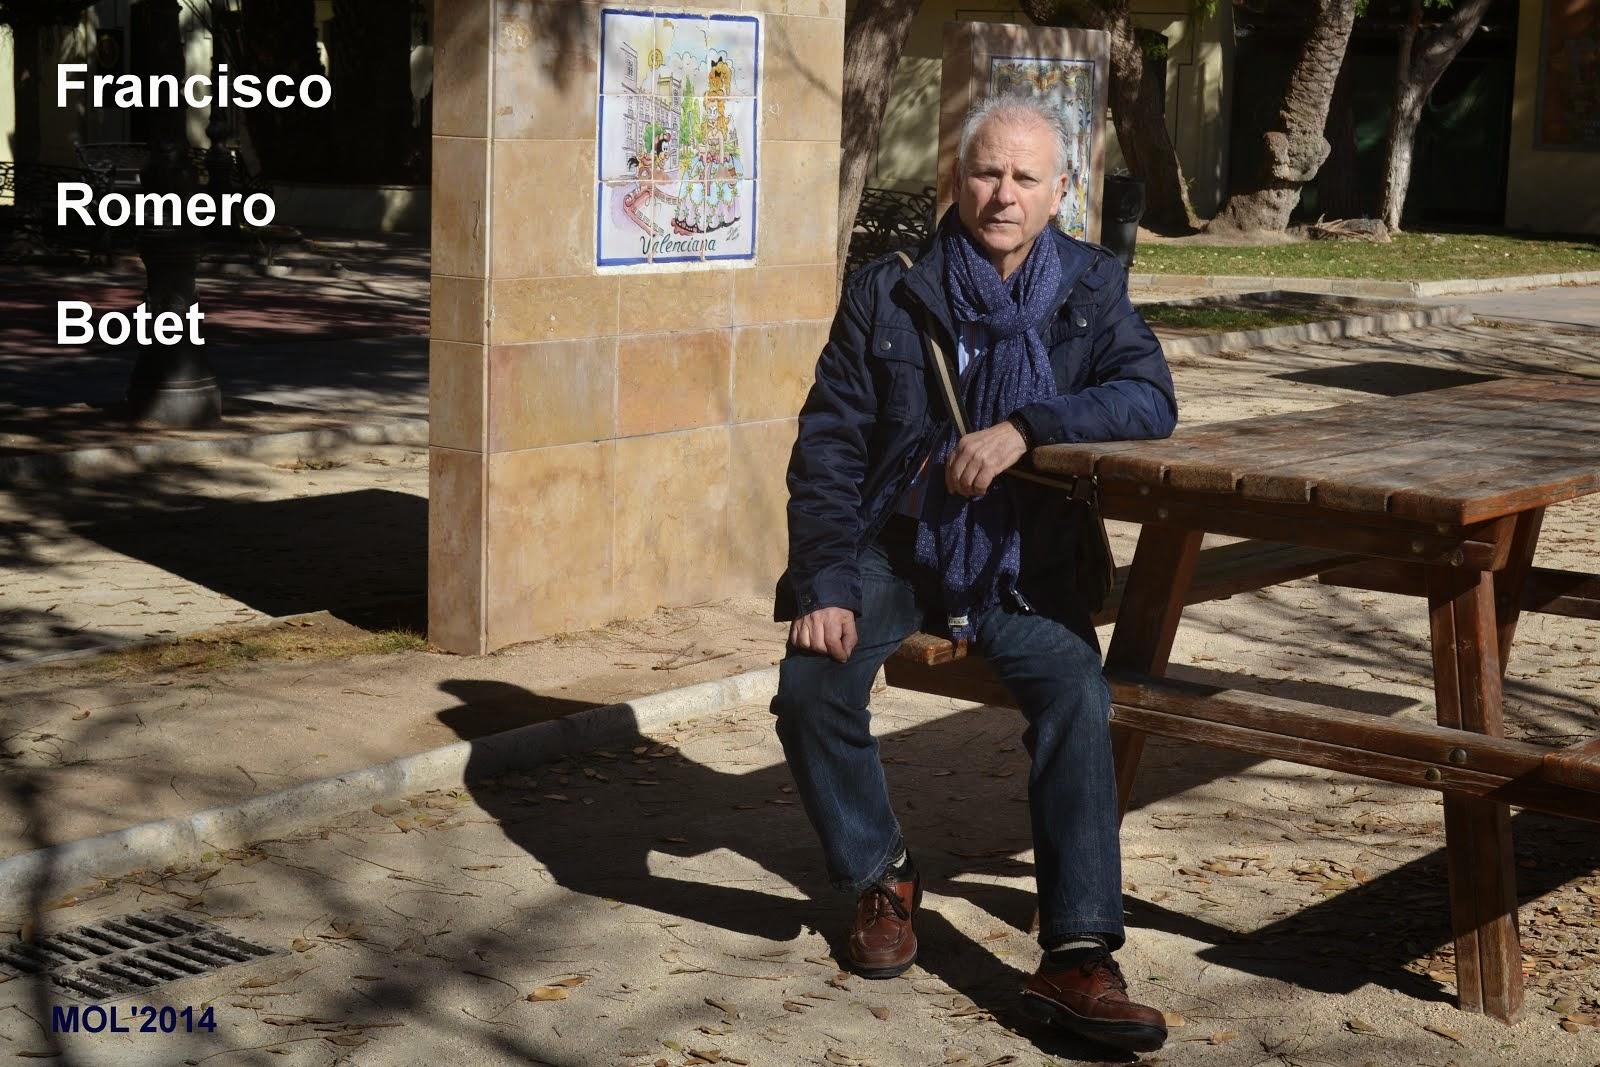 MAESTROS ARTESANOS CERAMISTAS: PACO ROMERO BOTET